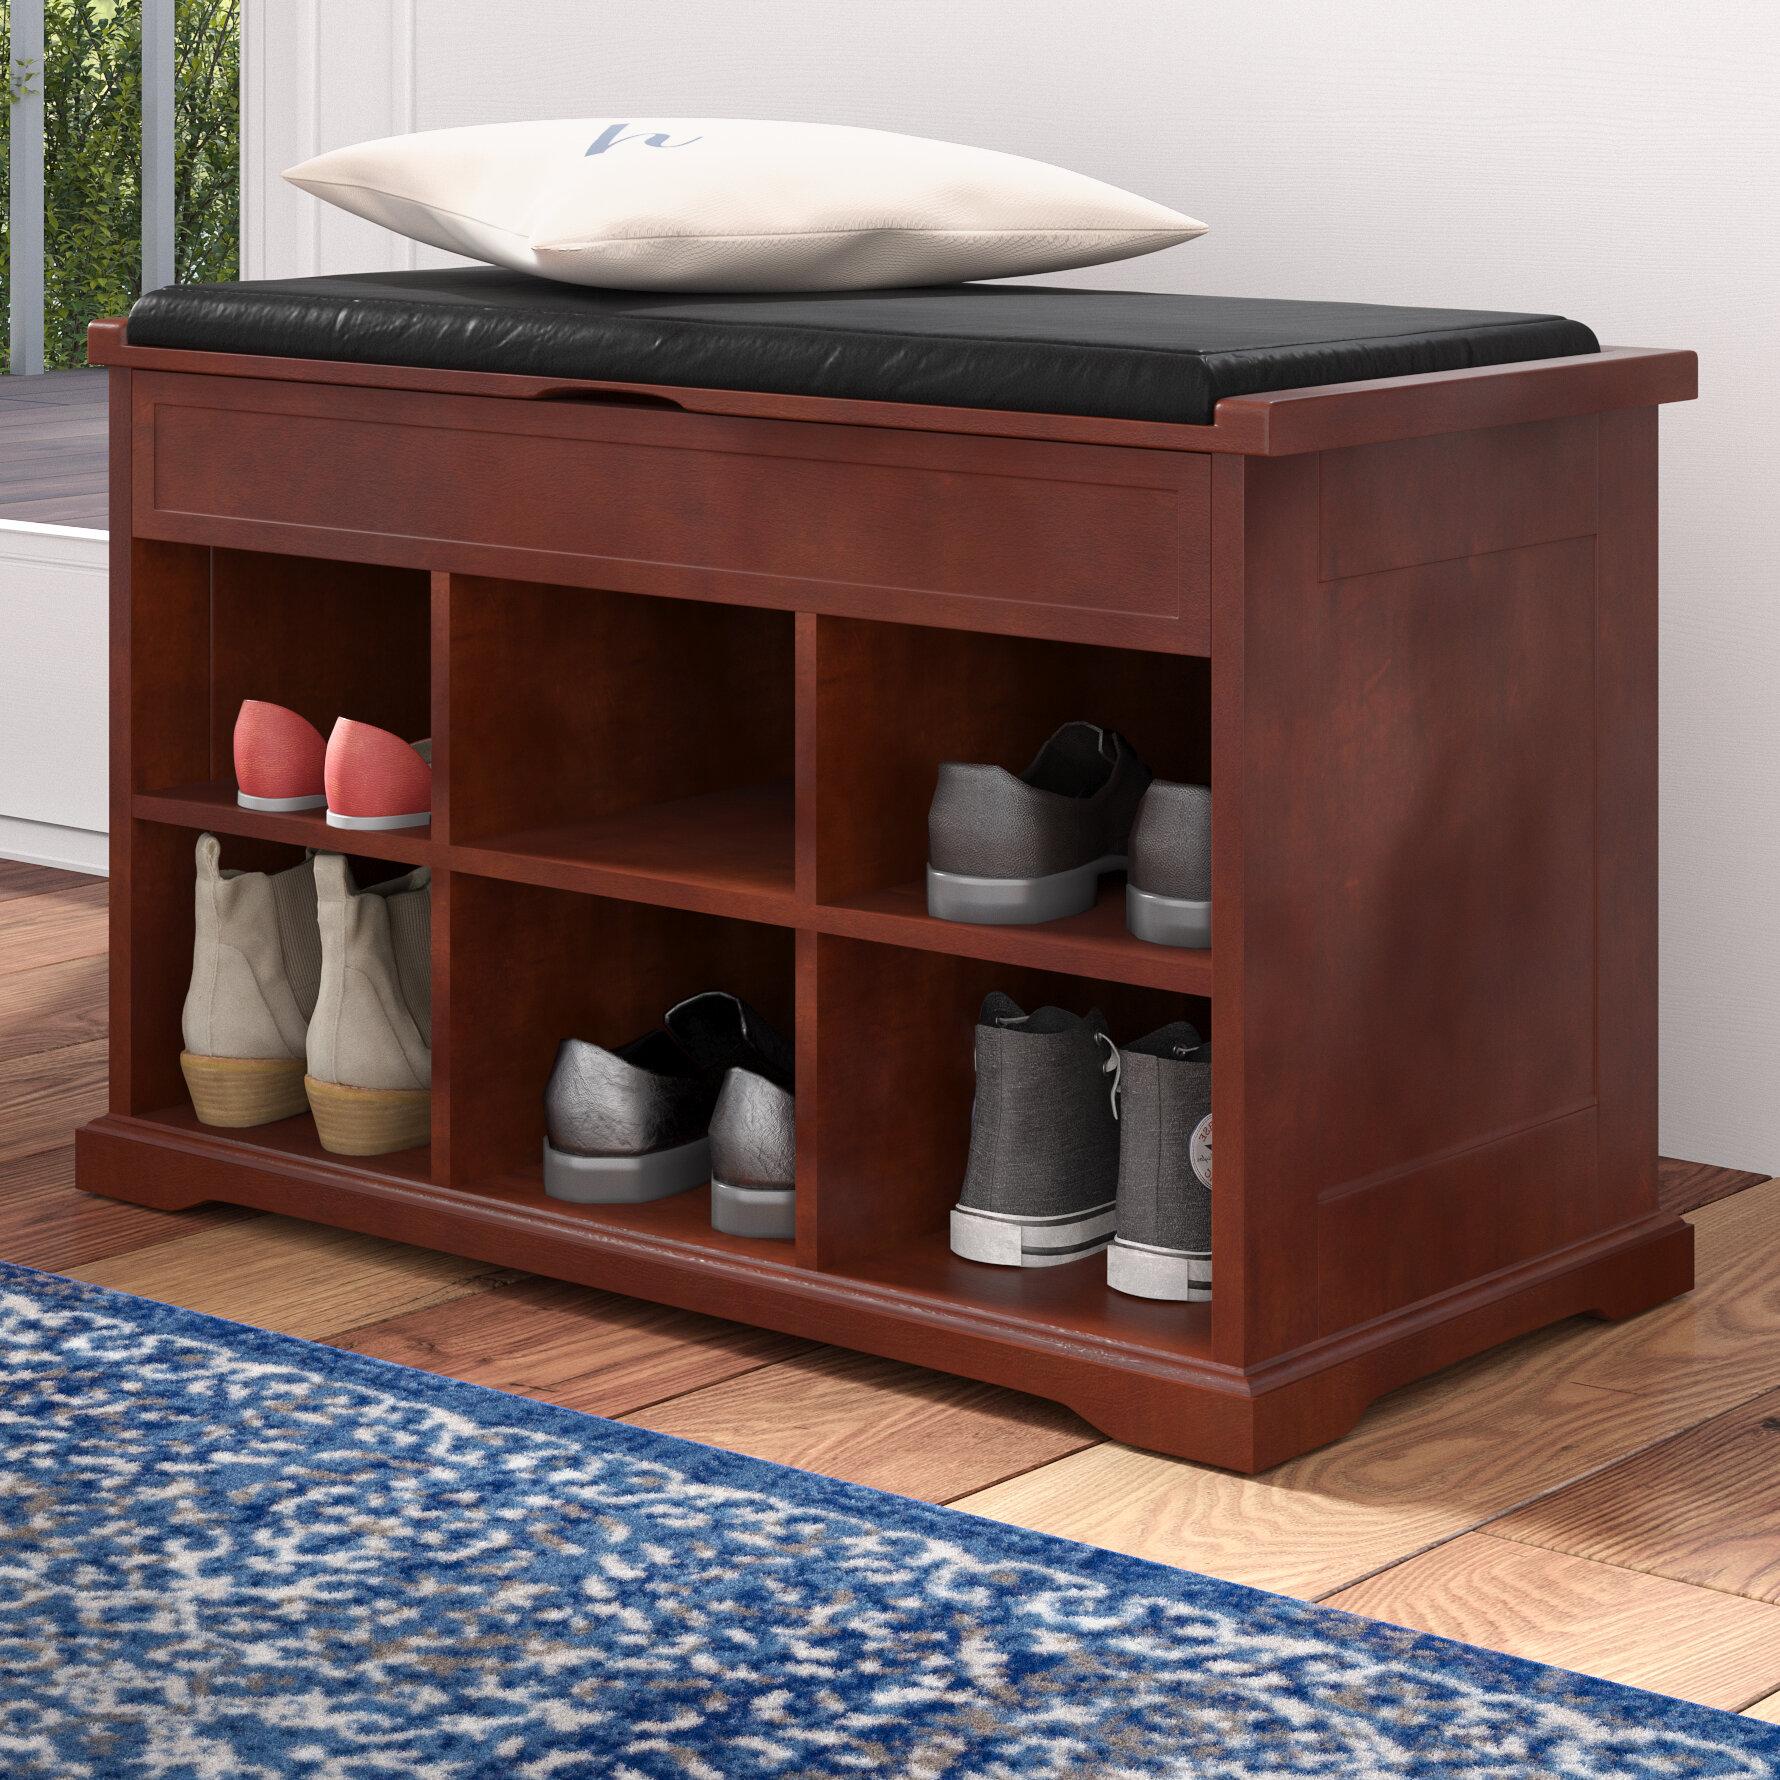 Charlton Home Barrentyne 6 Pair Shoe Storage Bench Reviews Wayfair